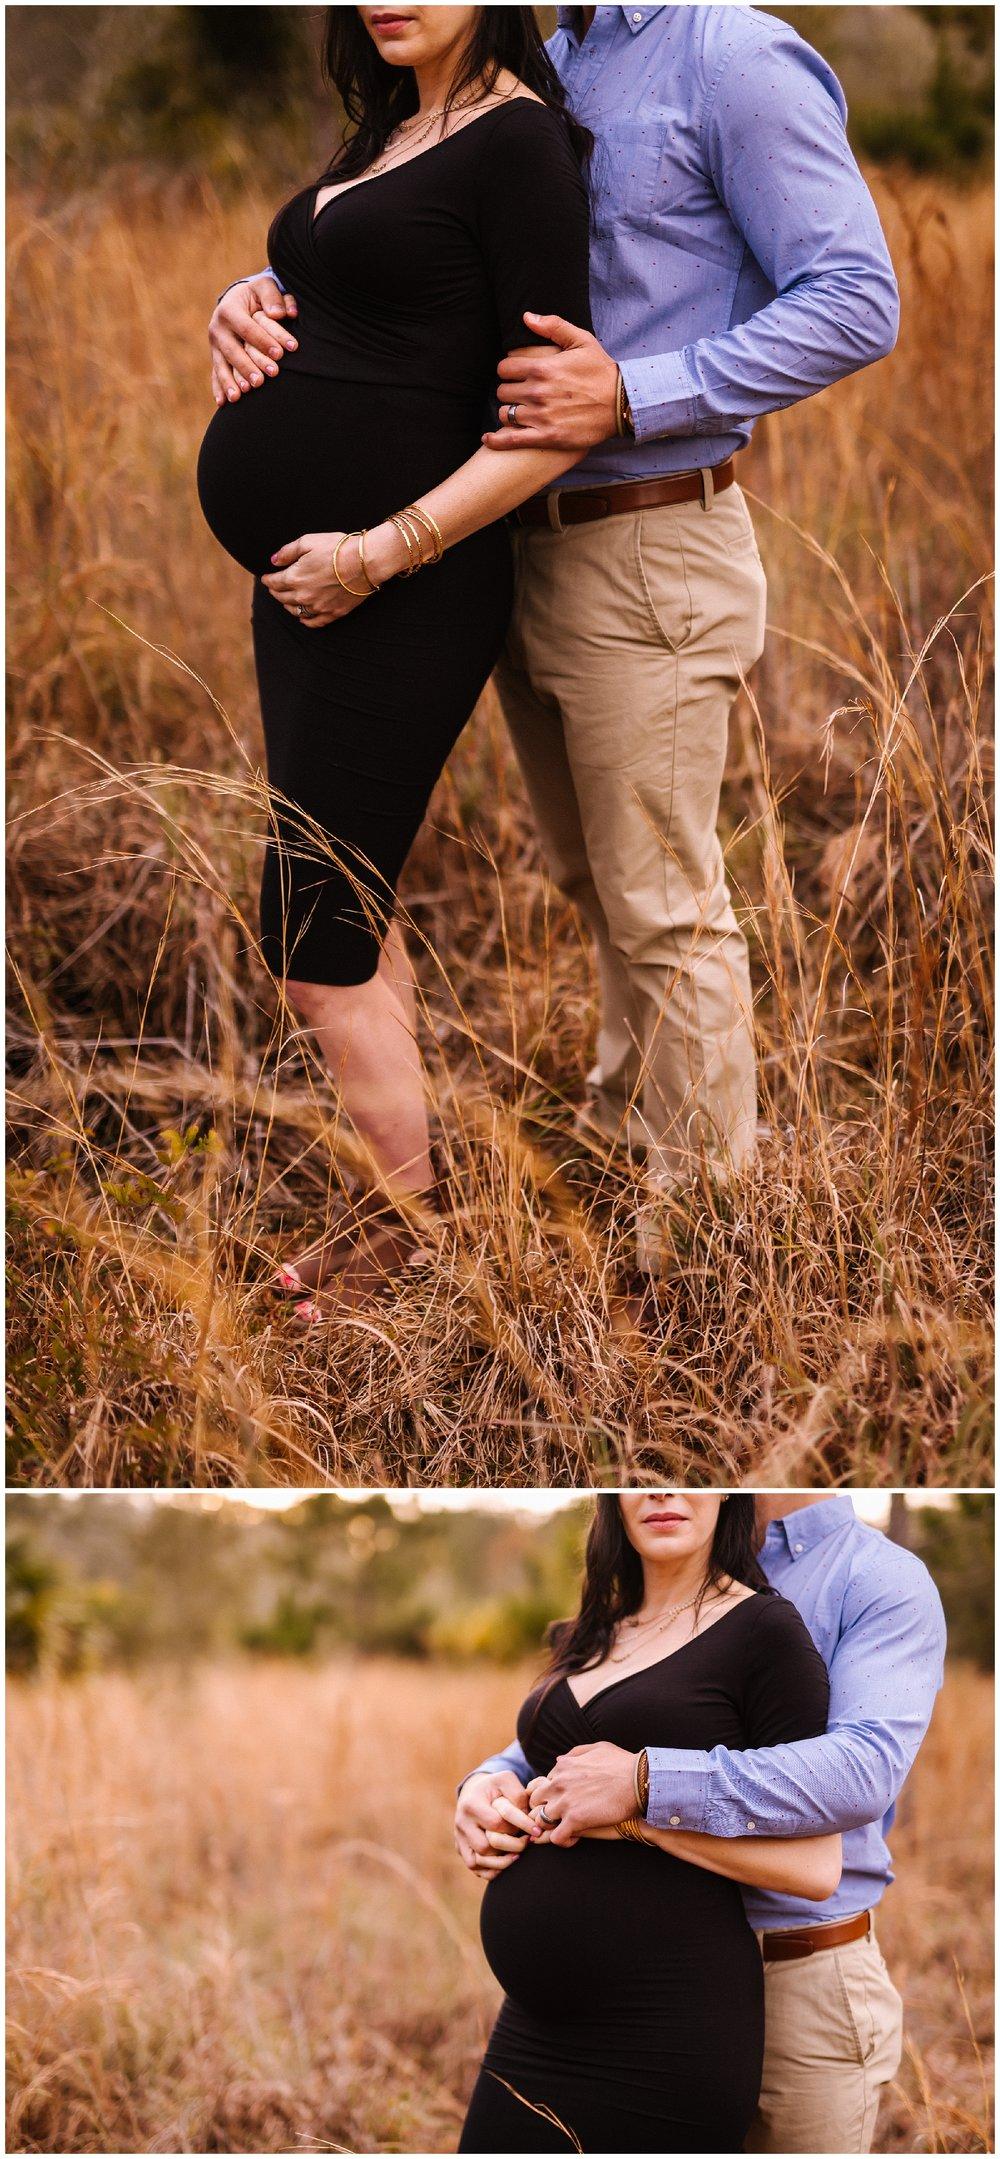 Tampa-maternity-photographer-morris-bridge-park-hip-tight-black-dress-woods_0018.jpg